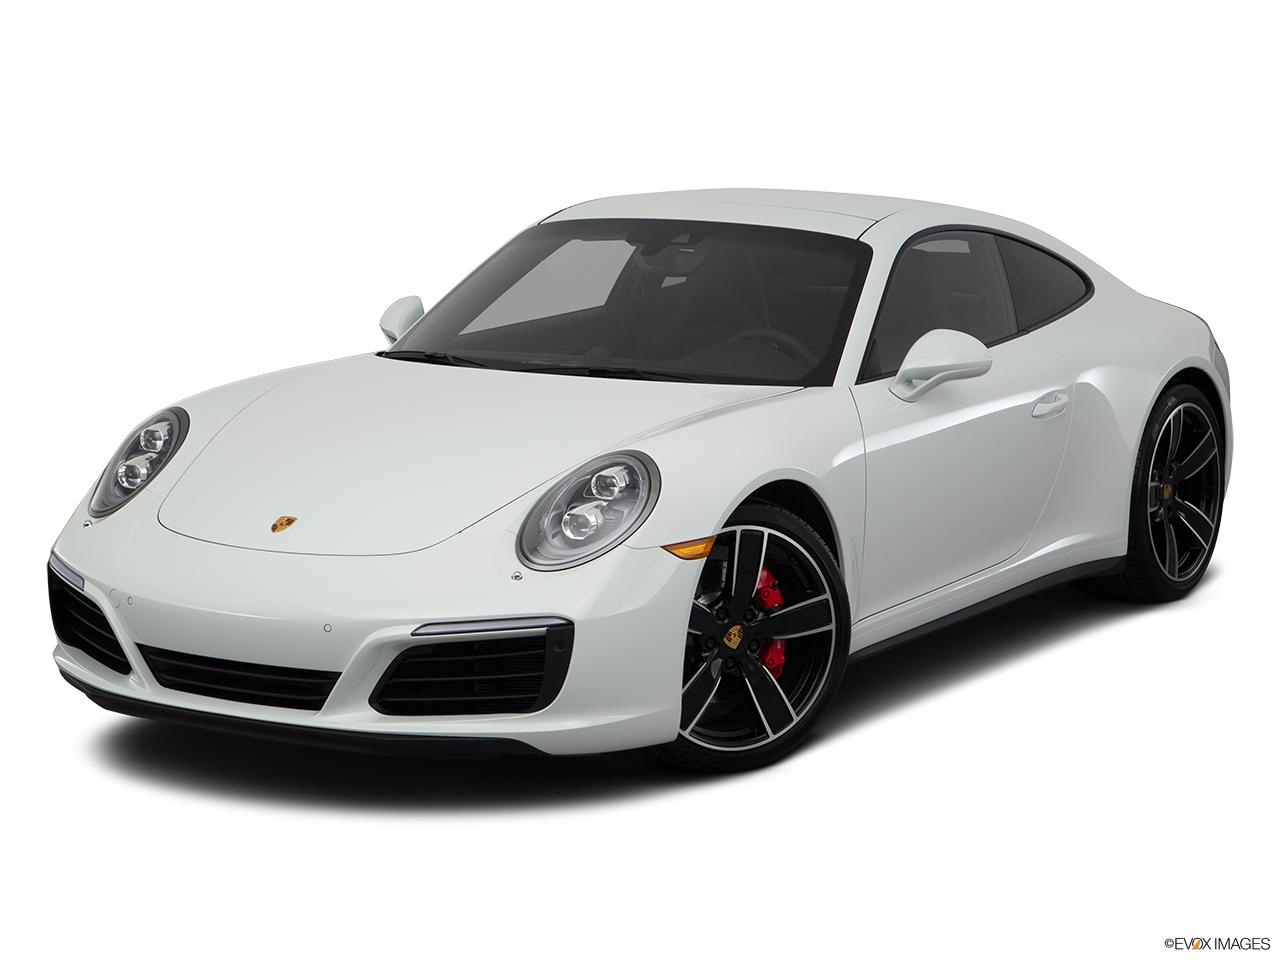 Porsche 911 2017 Carrera 4s In Uae New Car Prices Specs